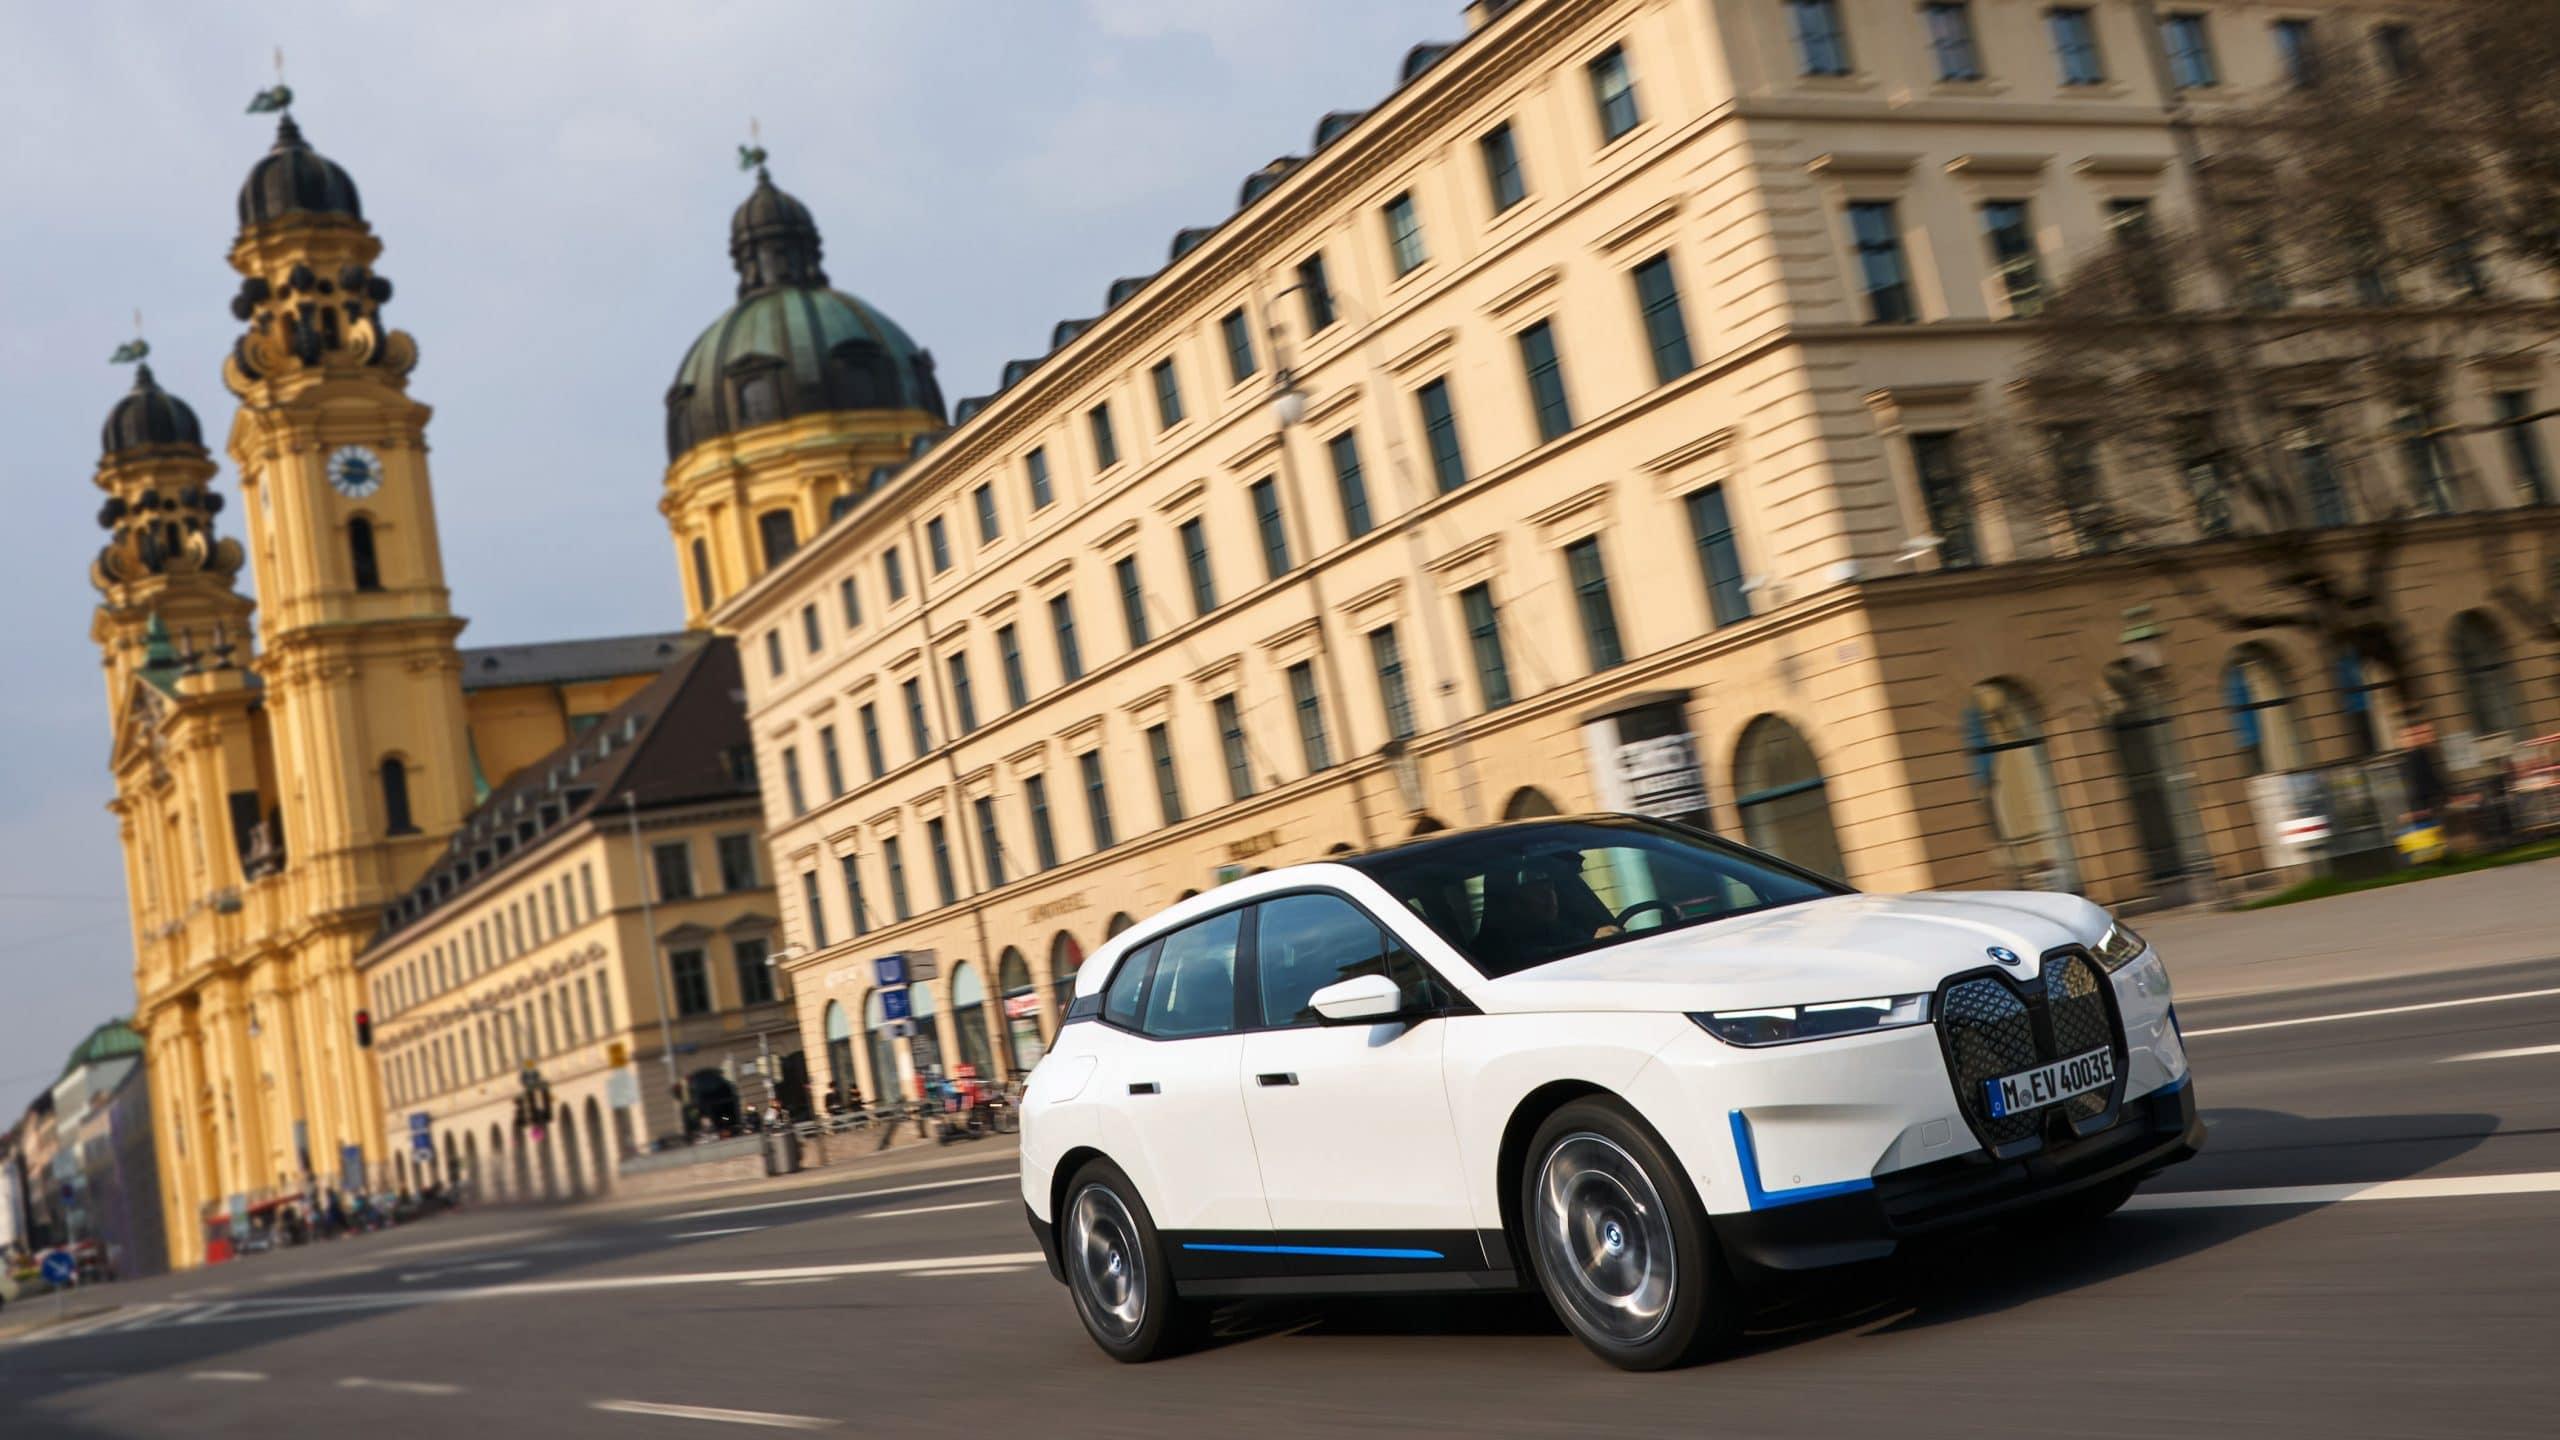 P90422023 highRes scaled Το BMW Group στο Σαλόνι Αυτοκινήτου IAA MOBILITY 2021 BMW, BMW Group, BMW Mottorad, IAA, IAA MOBILITY, IAA MOBILITY 2021, Mini, ειδήσεις, Νέα